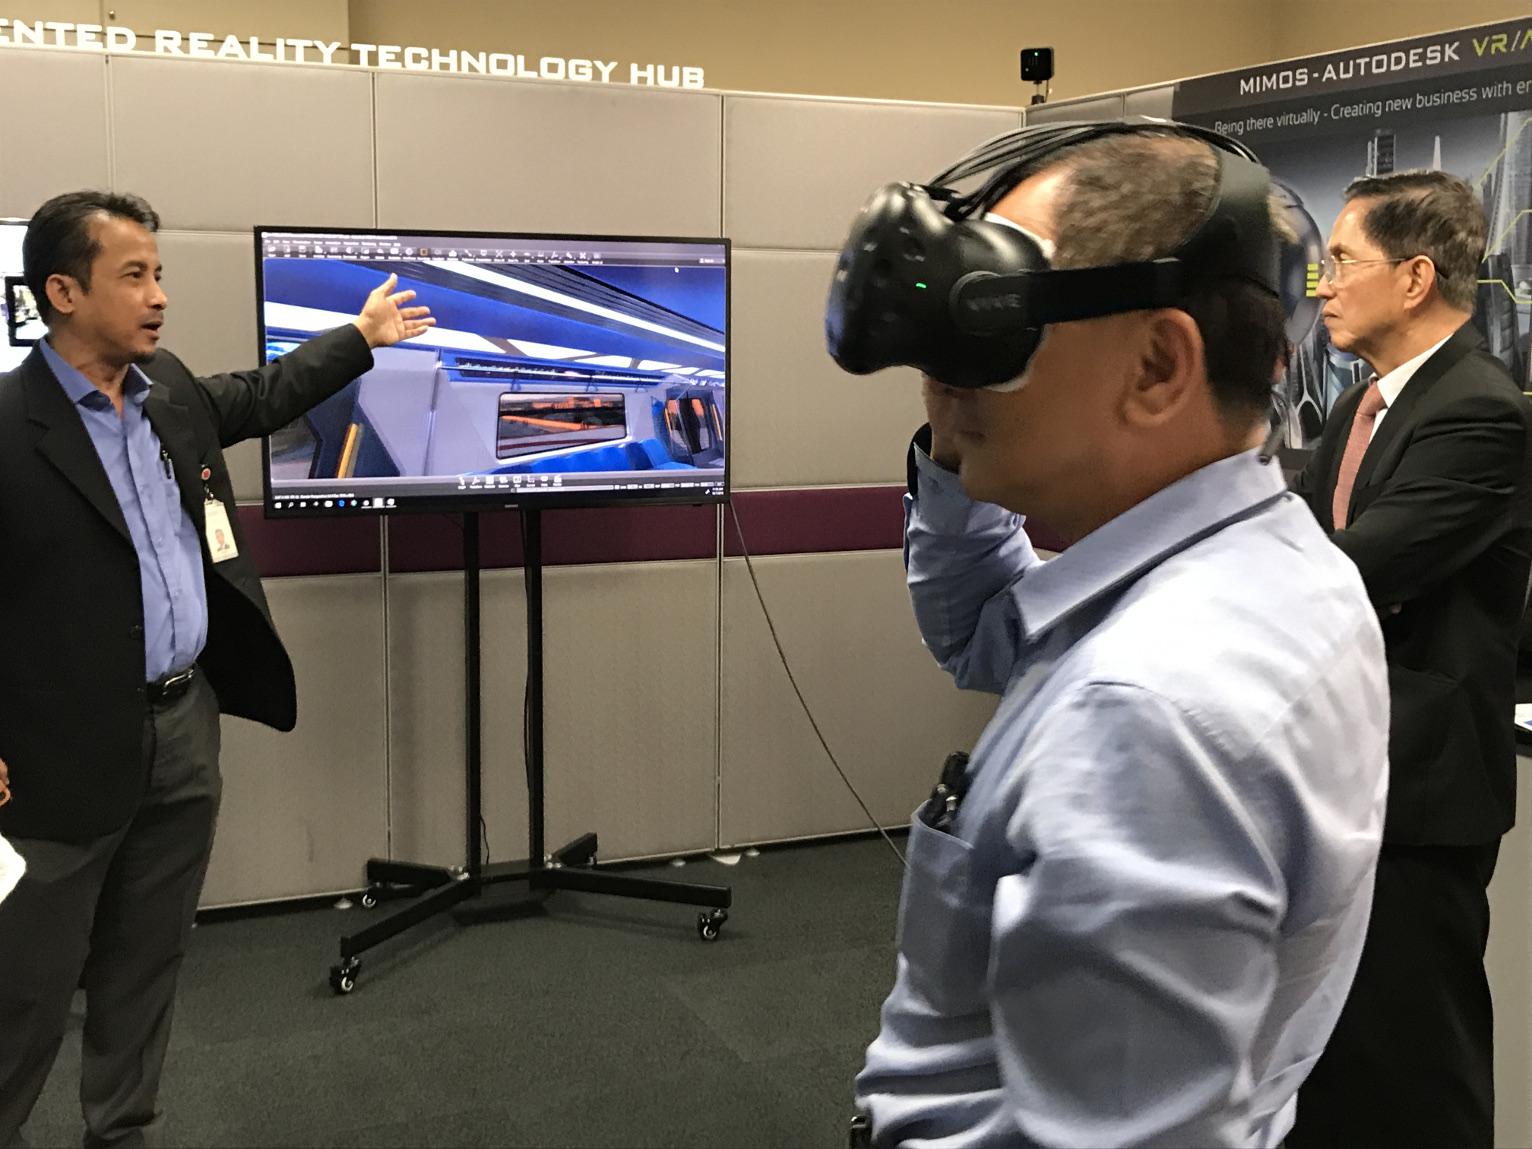 Mimos-Visit VR